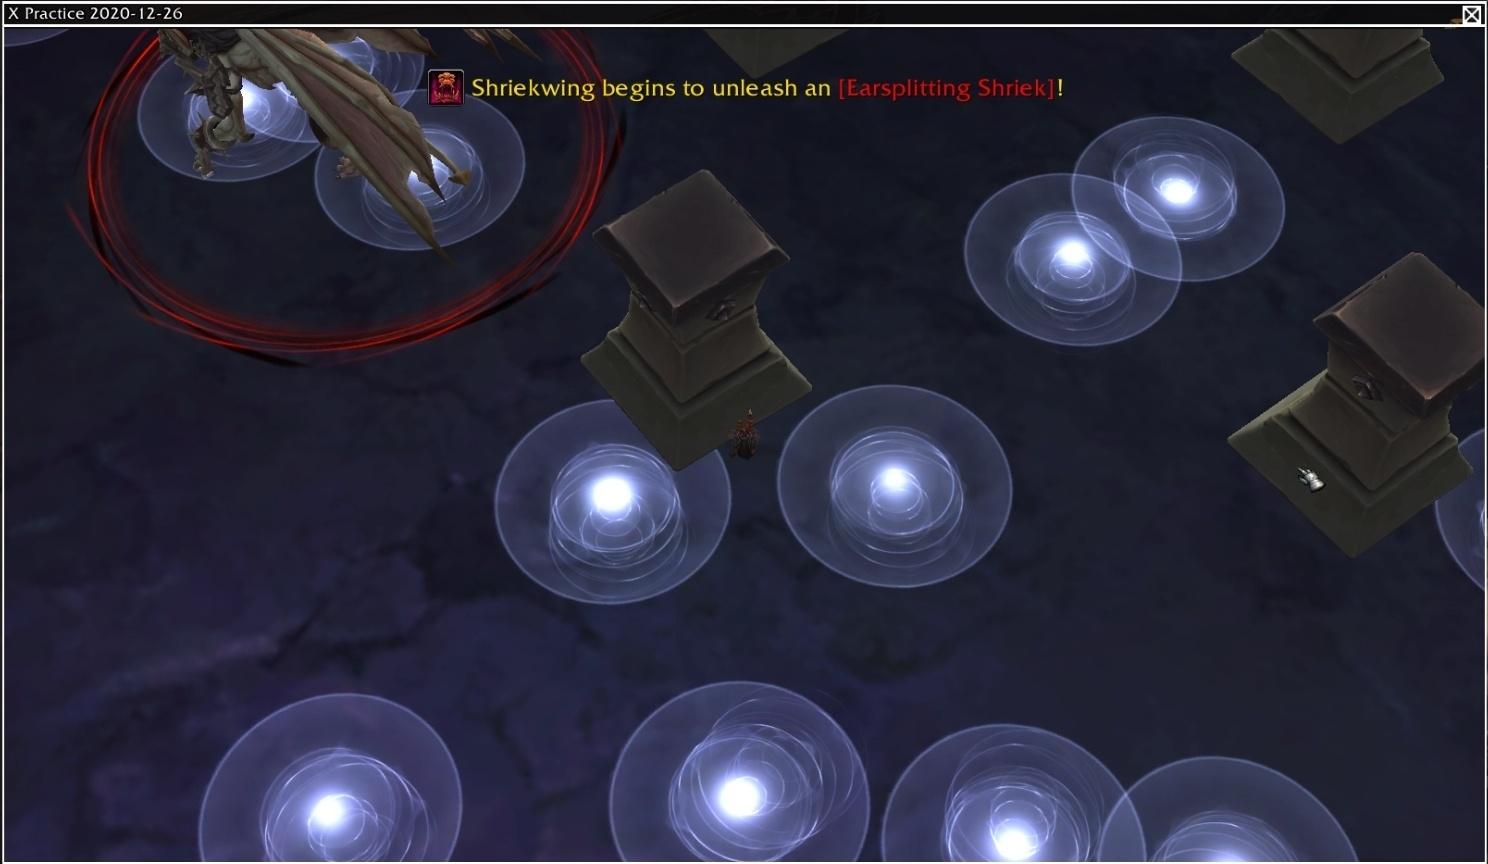 Practice Shadowlands Raid Mechanics with the X Practice Addon - Wowhead News